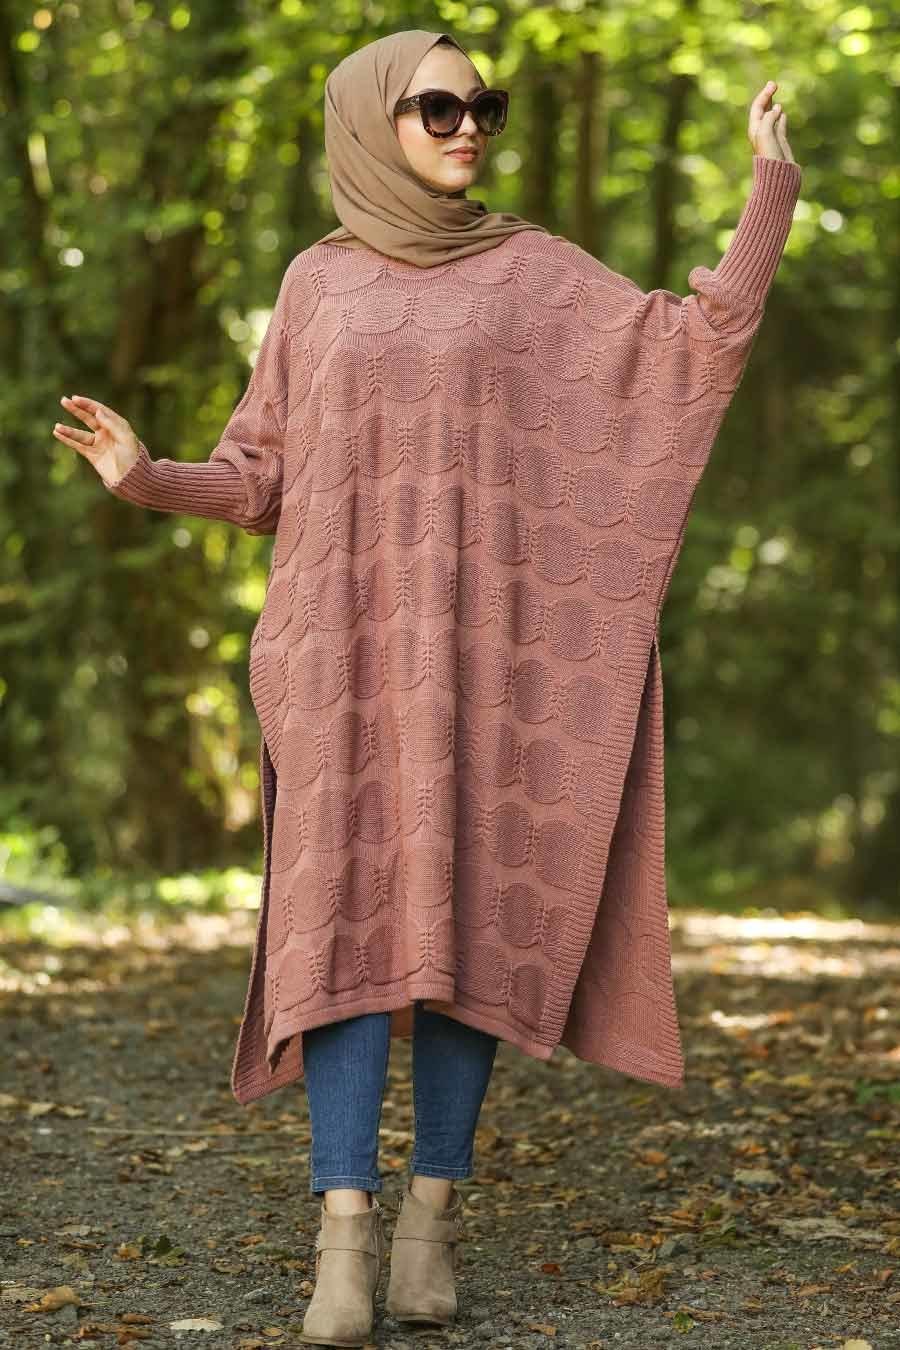 Neva Style - Dusty Rose Hijab Knitwear Poncho 15652GK